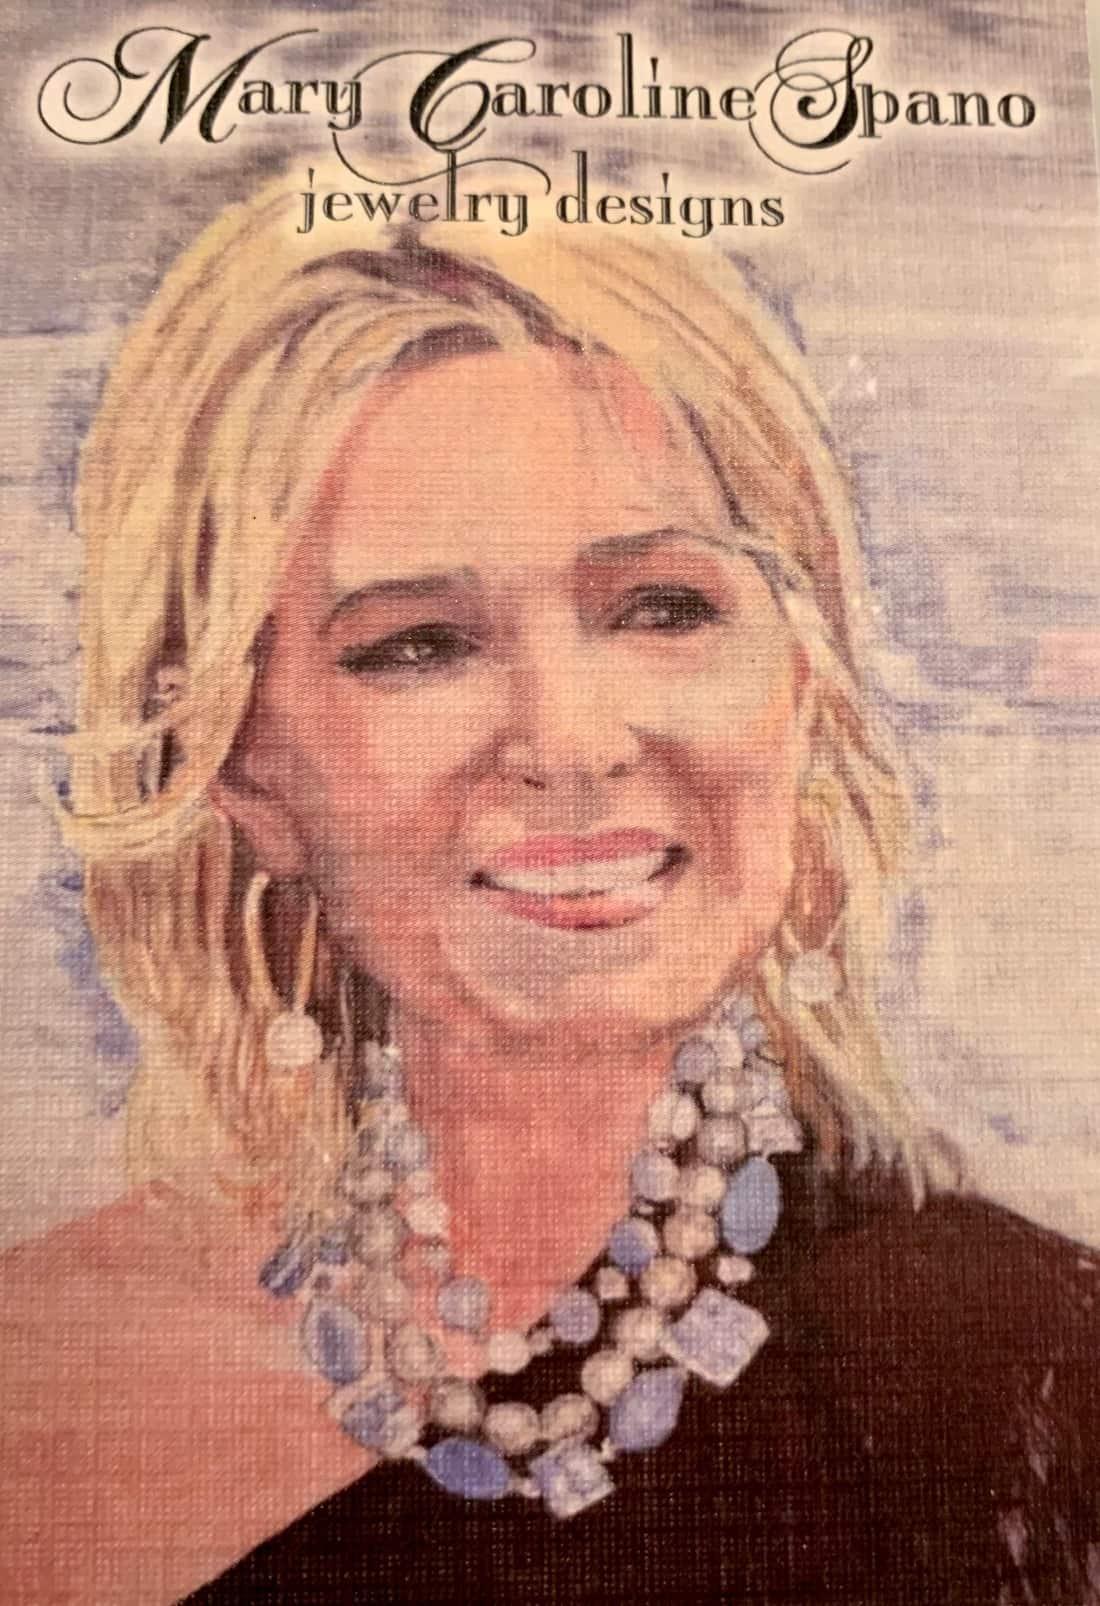 MARY CAROLINE SPANO JEWELRY